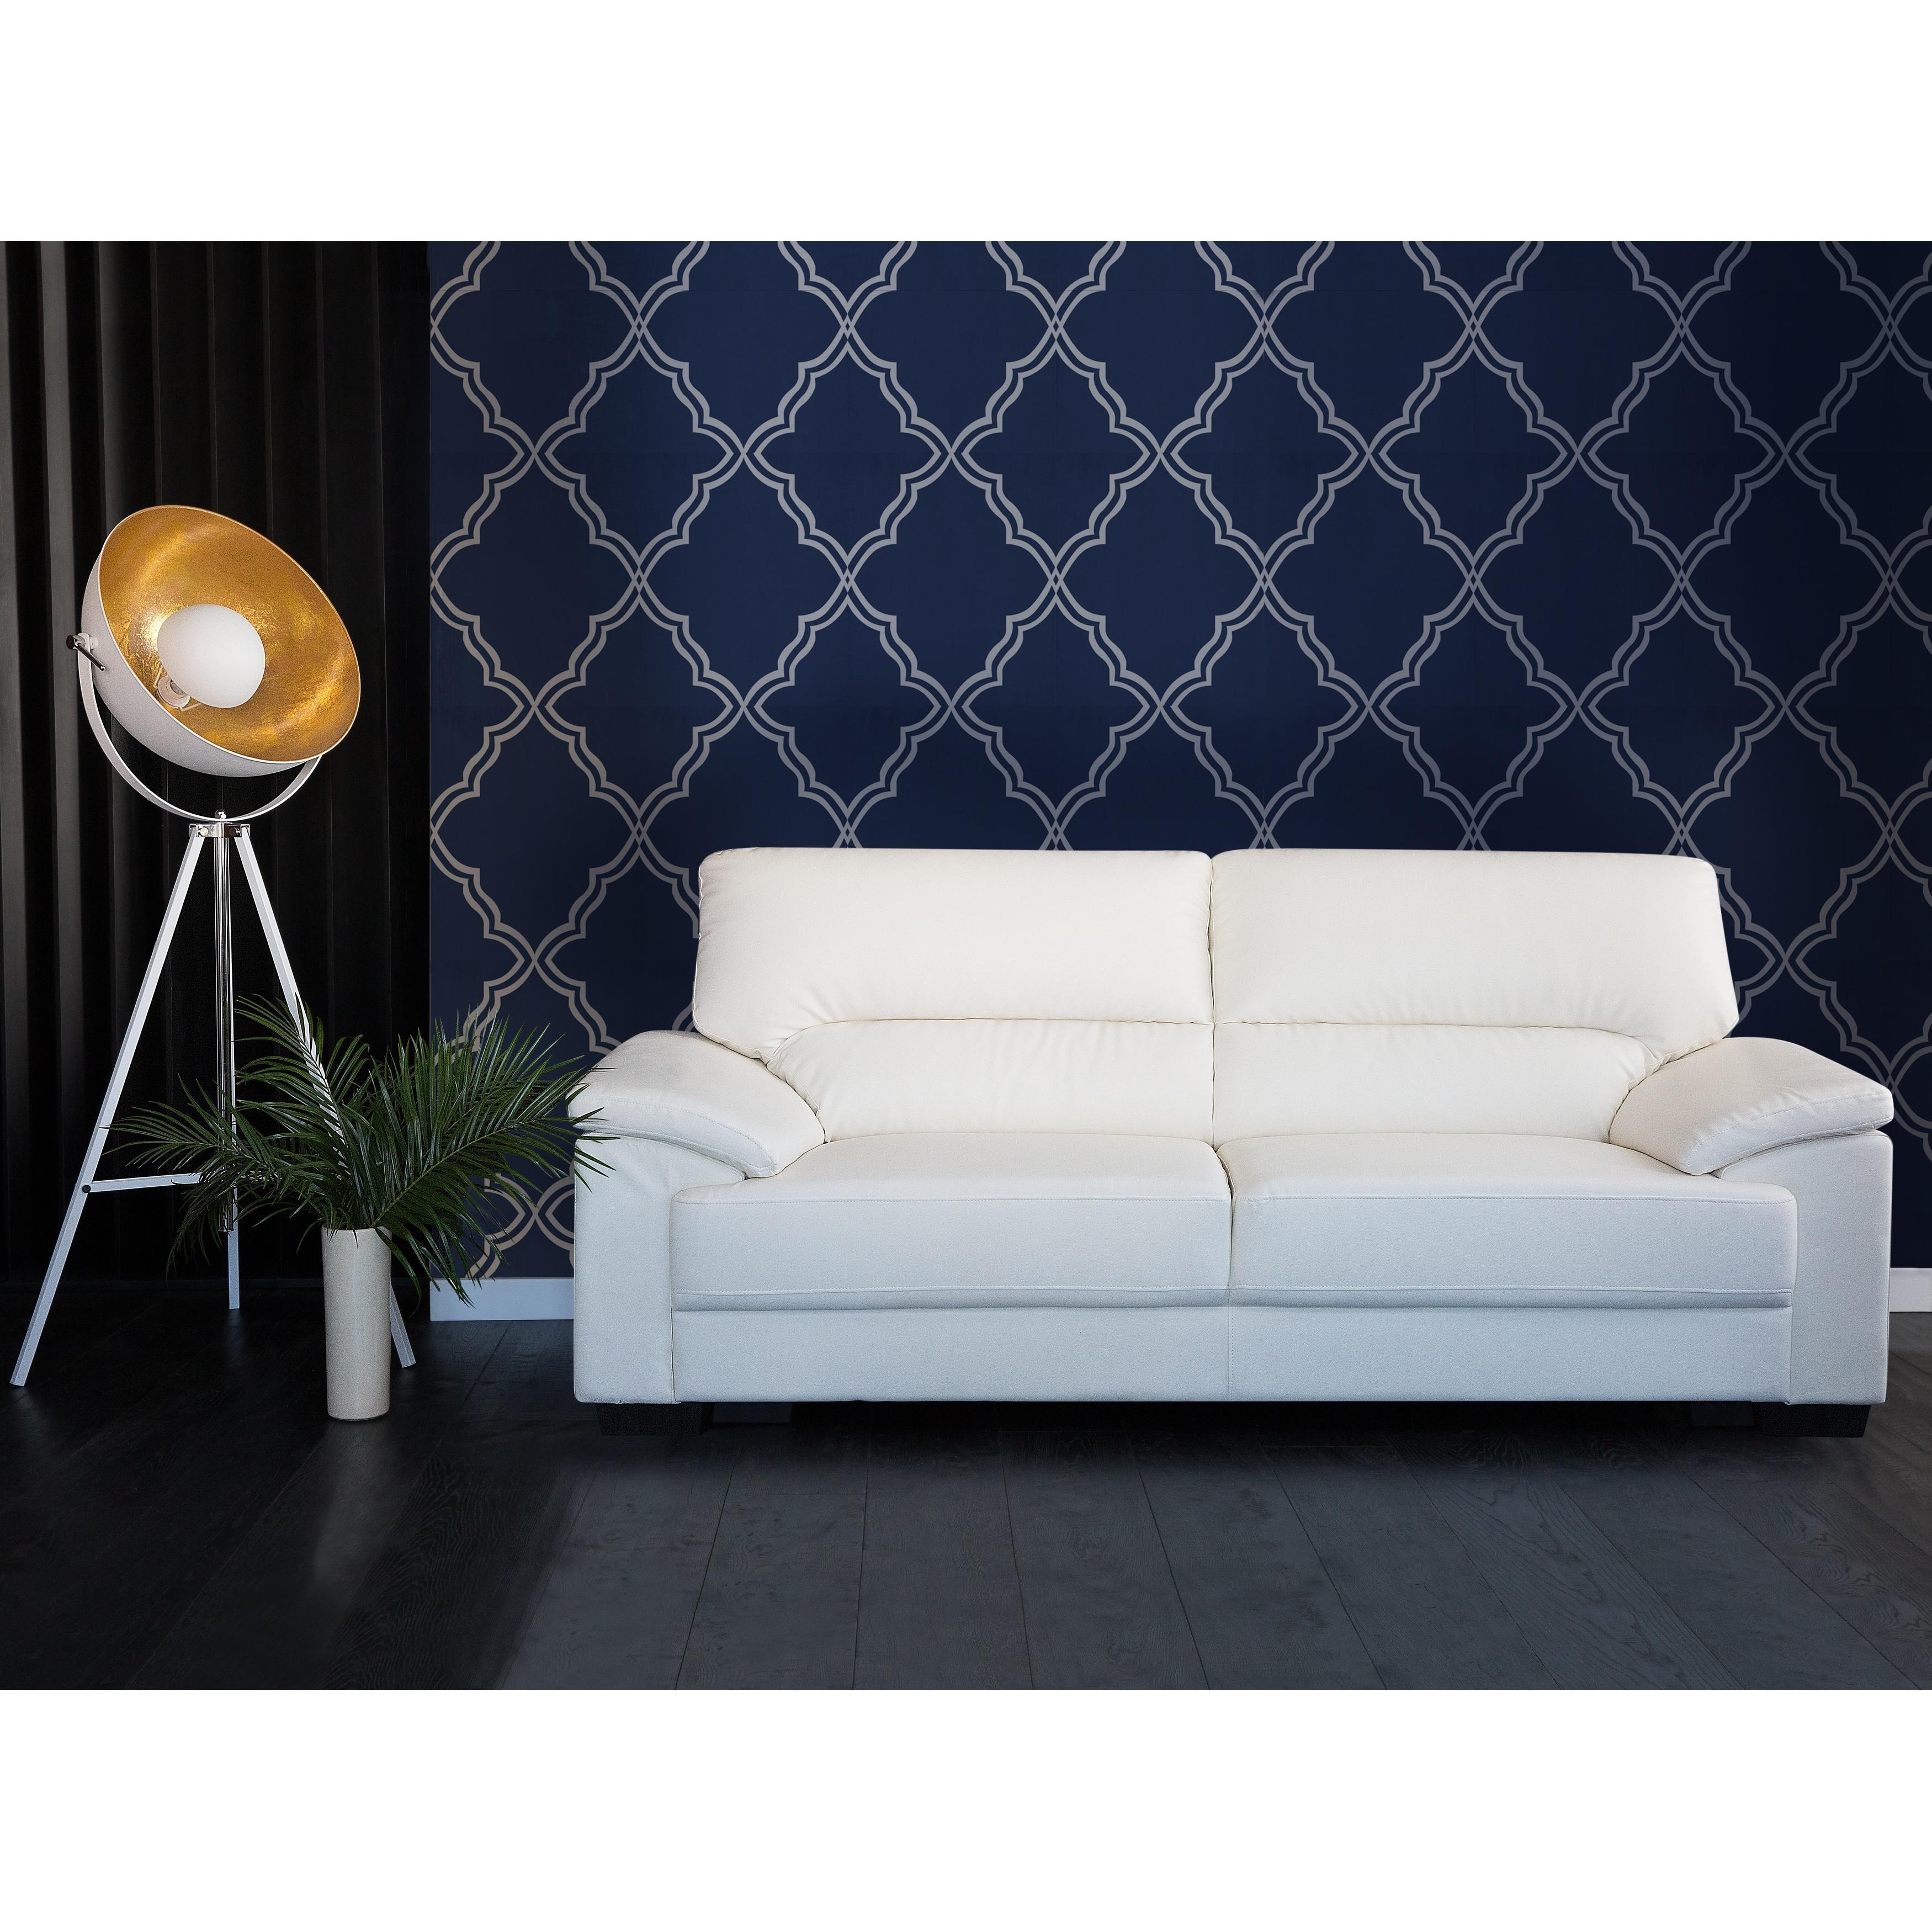 Shop Classic 3 Seater Leather Sofa - Cream VOGAR - Free Shipping ...